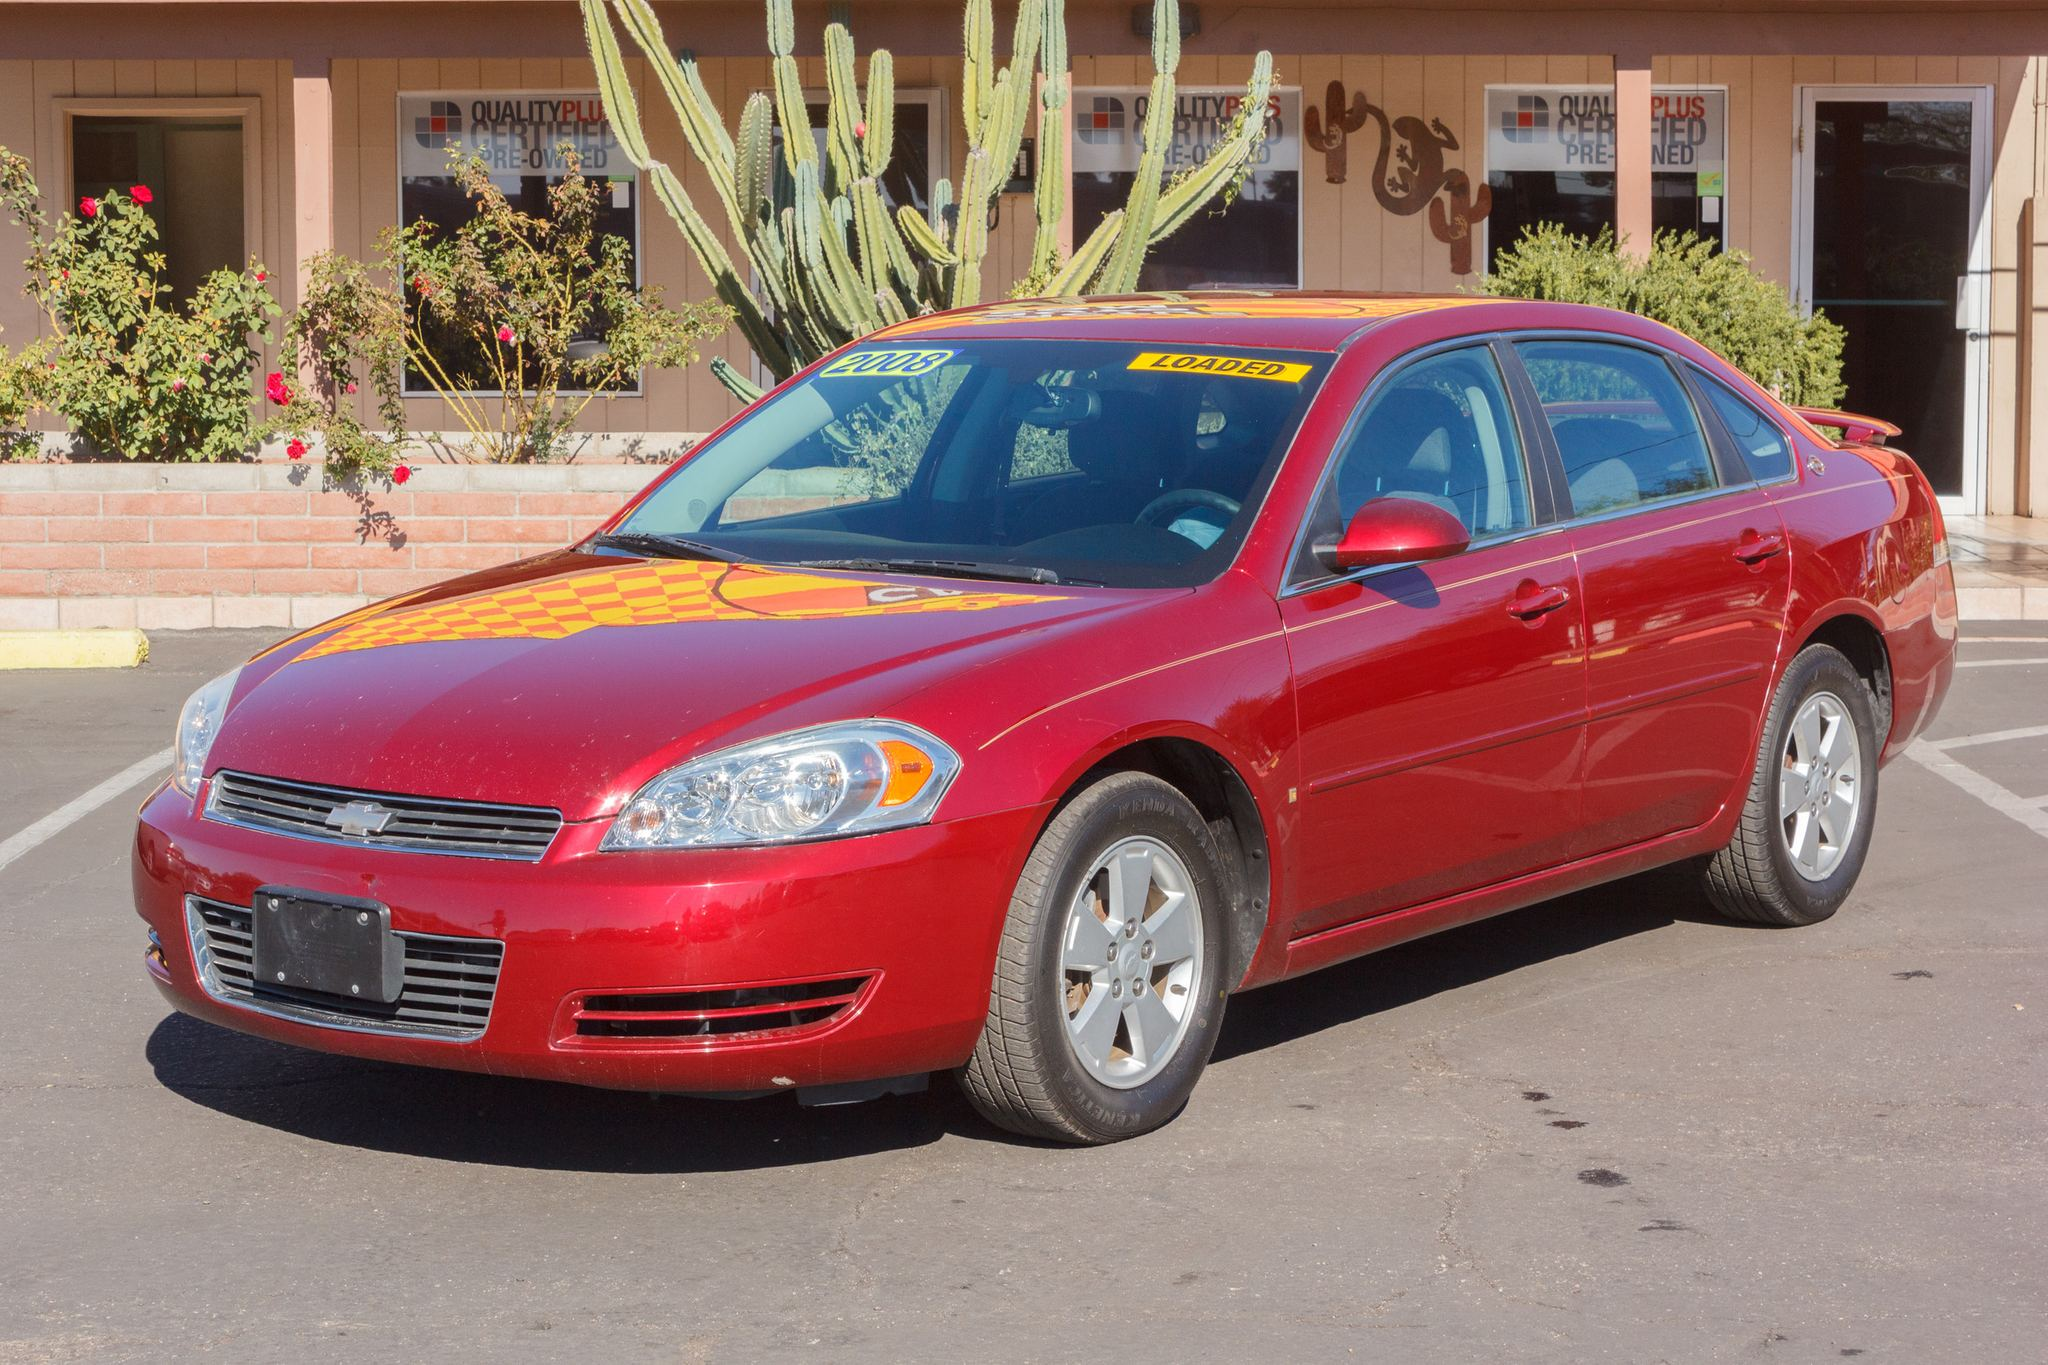 Photo of 2008 Chevrolet Impala 4d Sedan LT Precision Red